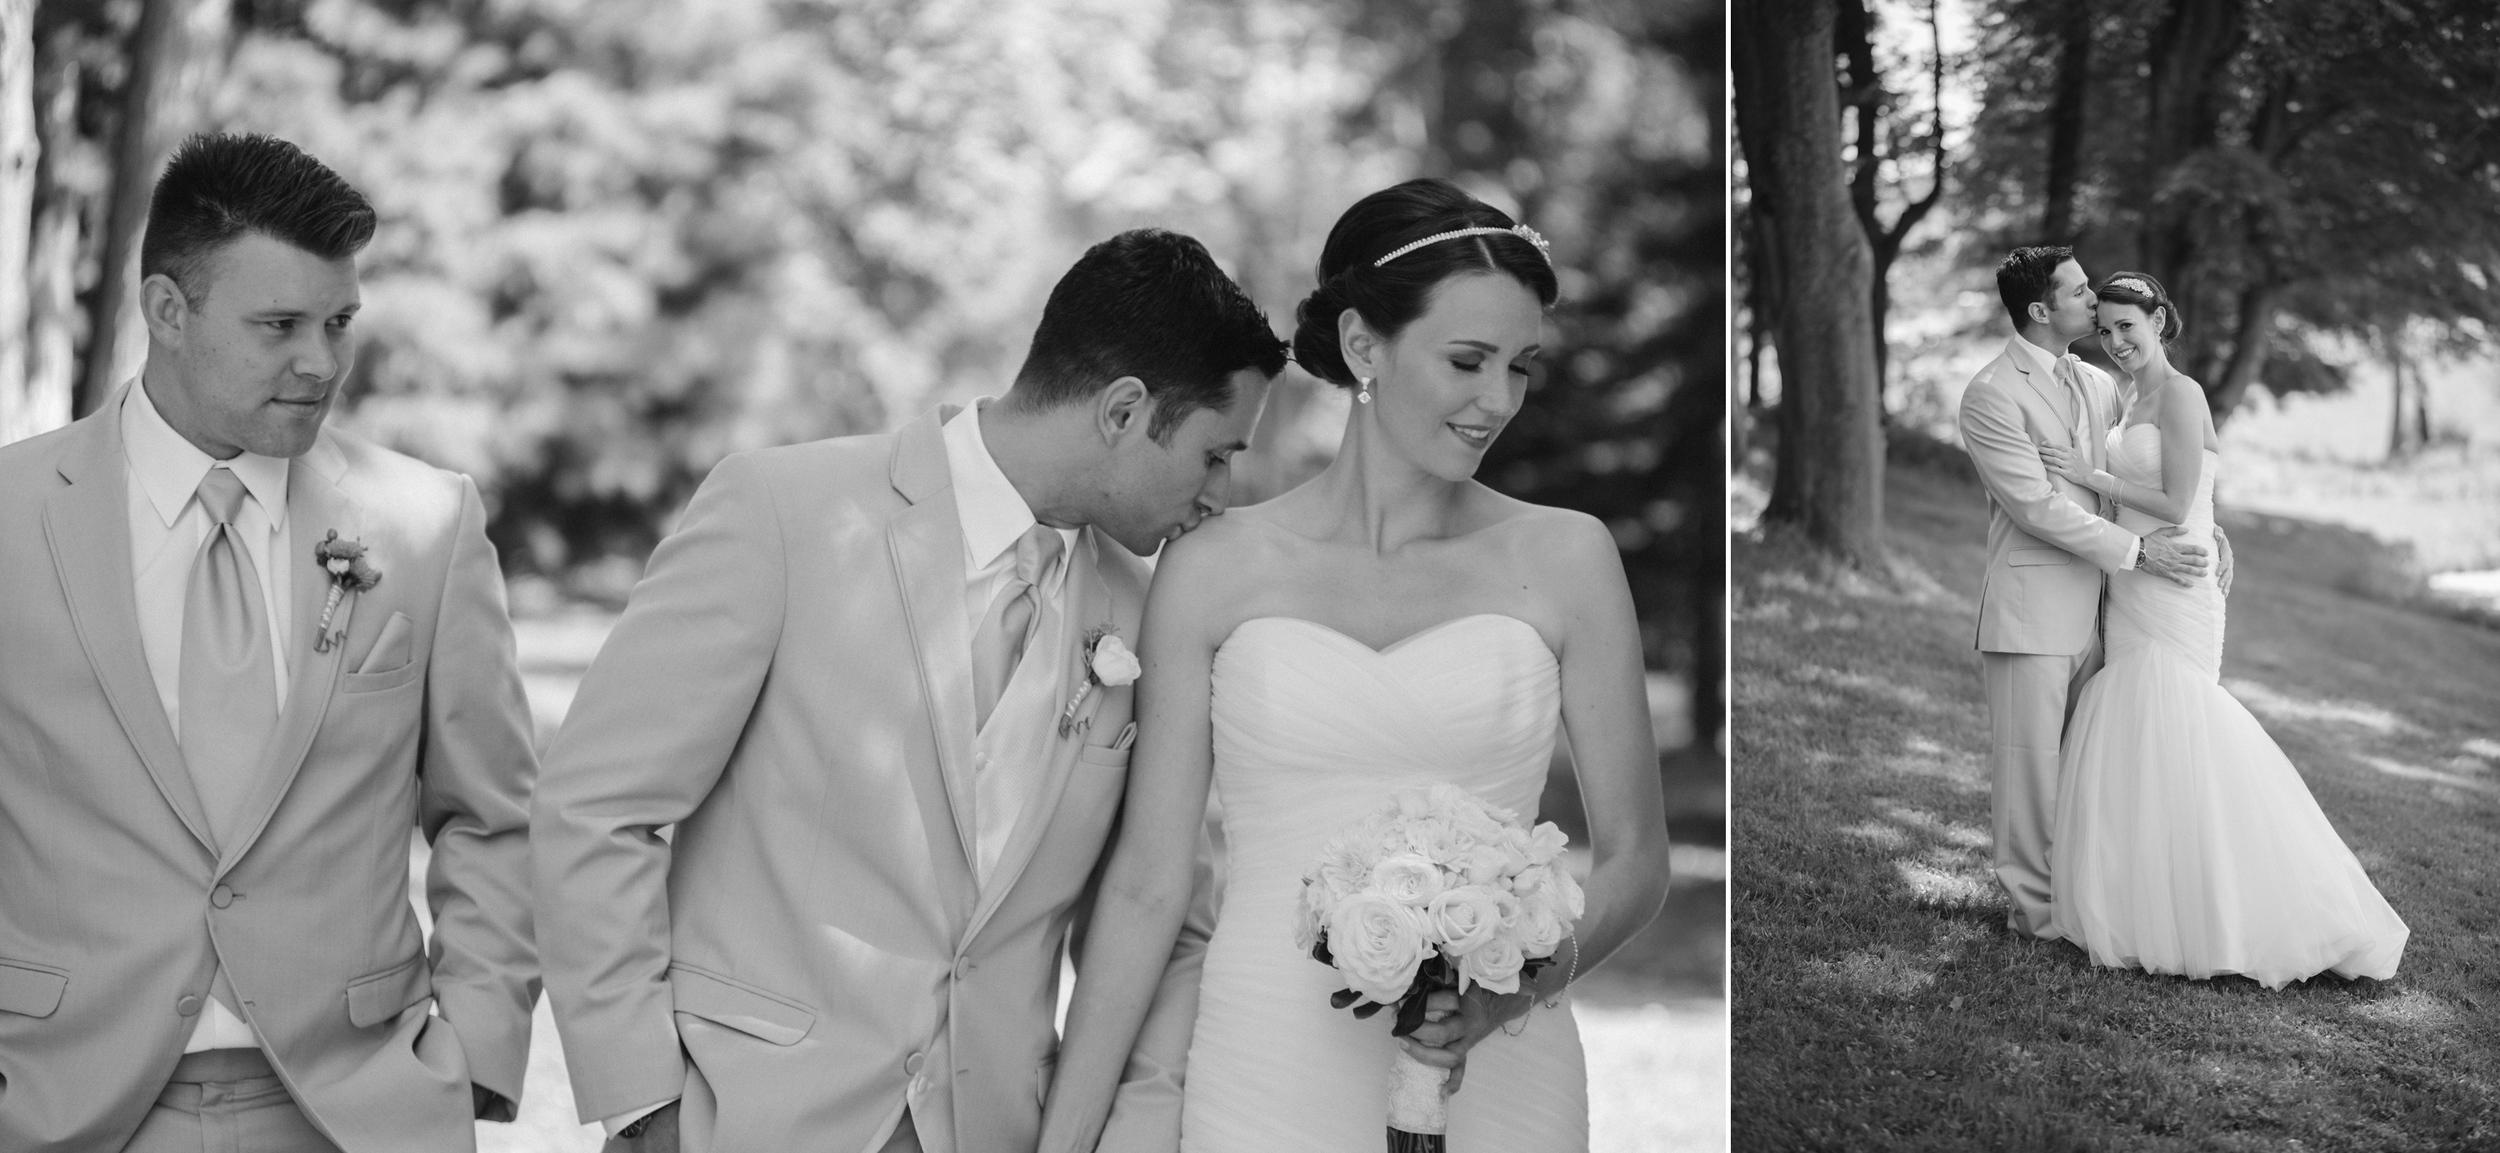 Matt_Swetel_Photography_Erin_and_Jeff_married021.jpg